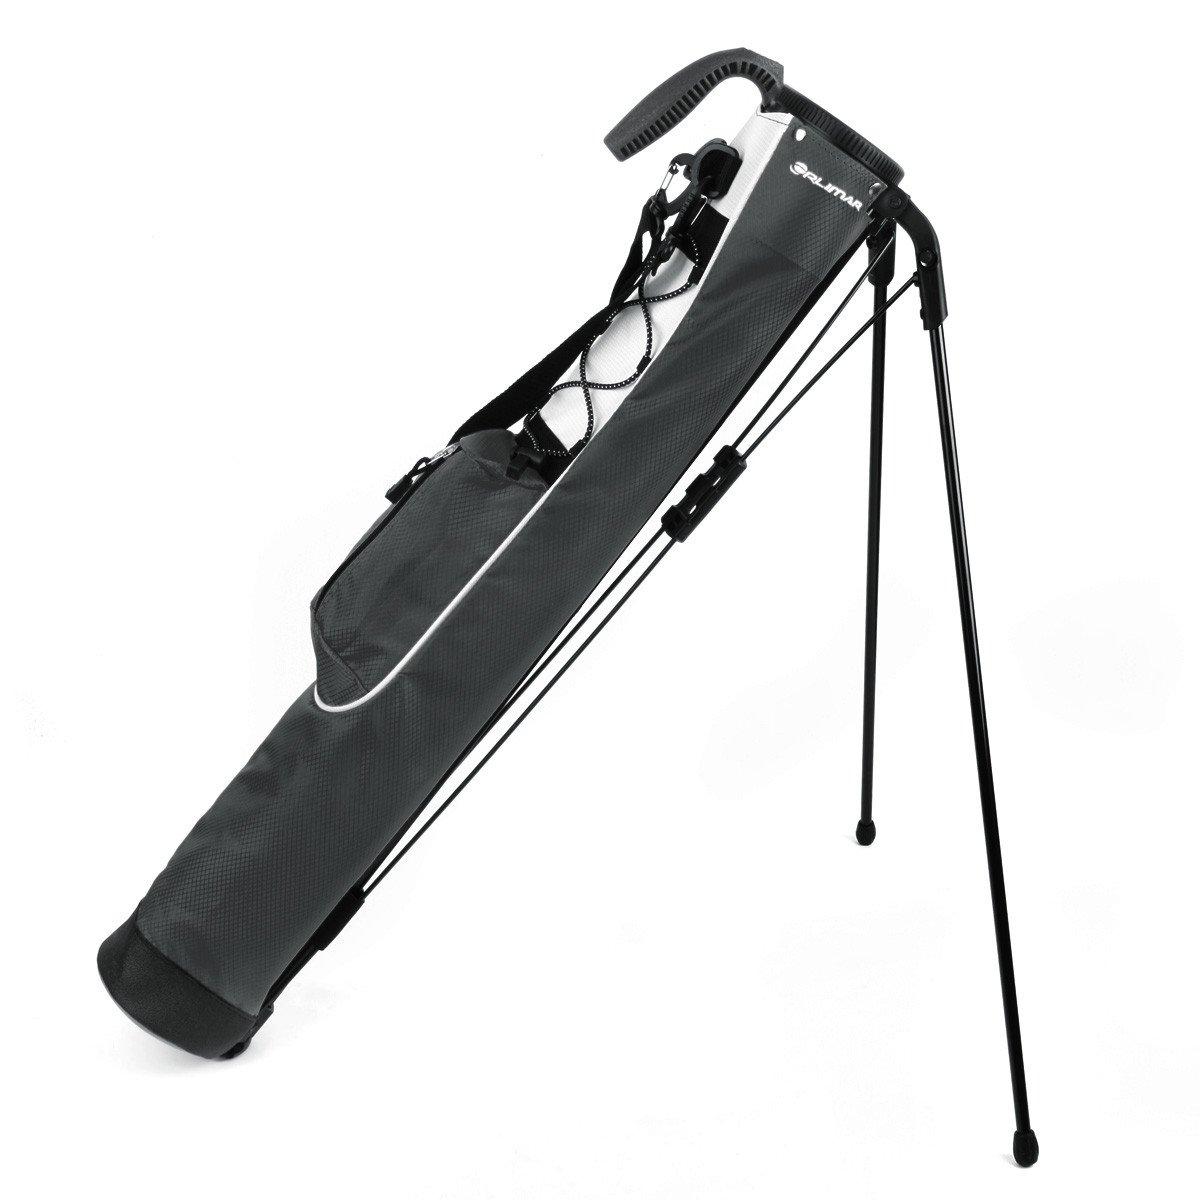 Orlimar Pitch & Putt Golf Lightweight Stand Carry Bag, Slate Grey by Orlimar